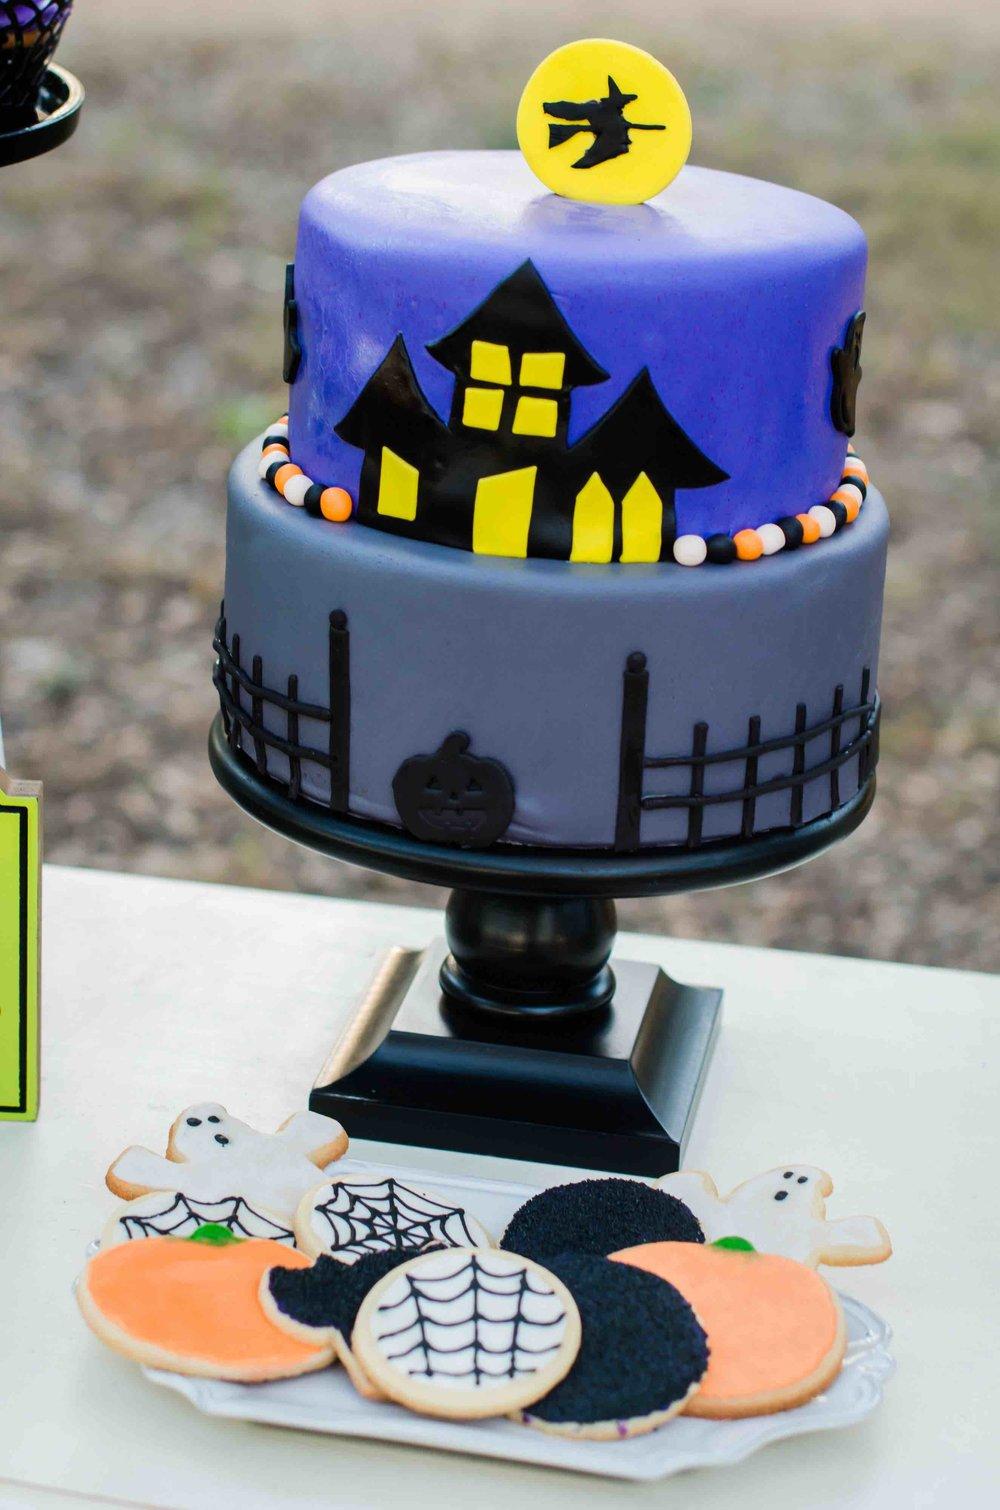 Halloween party ideas / Kids Halloween party ideas / Halloween dessert table ideas /Halloween party decor / Cute Halloween party ideas and decor / Halloween dessert ideas /Styled by Carolina from MINT Event Design / www.minteventdesign.com